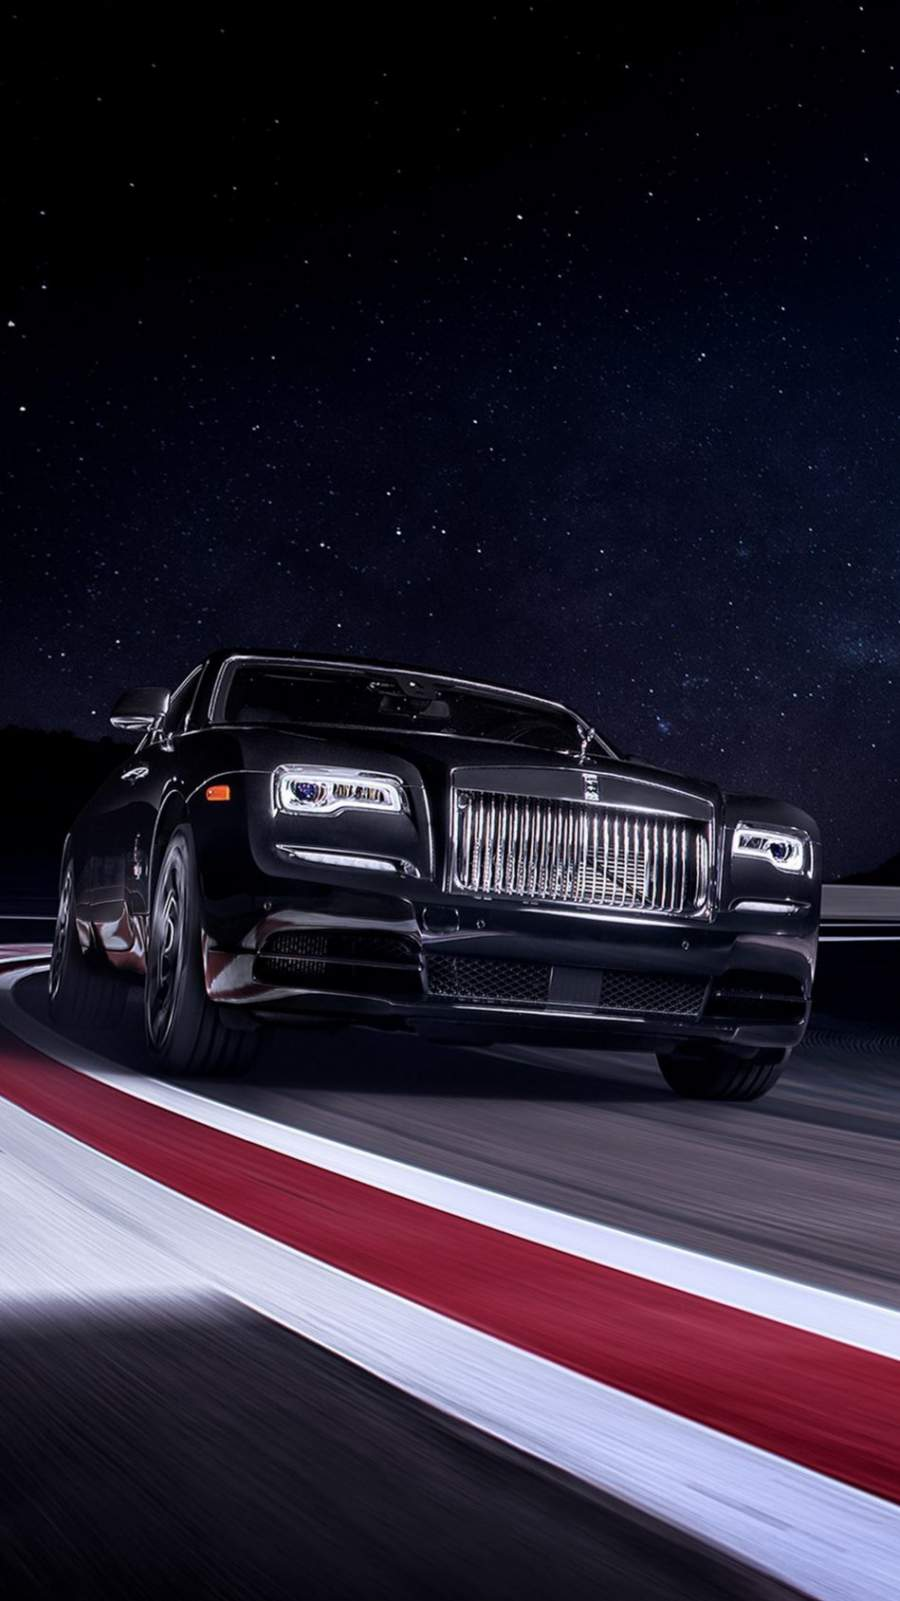 Rolls Royce Black On Race Track iPhone Wallpaper